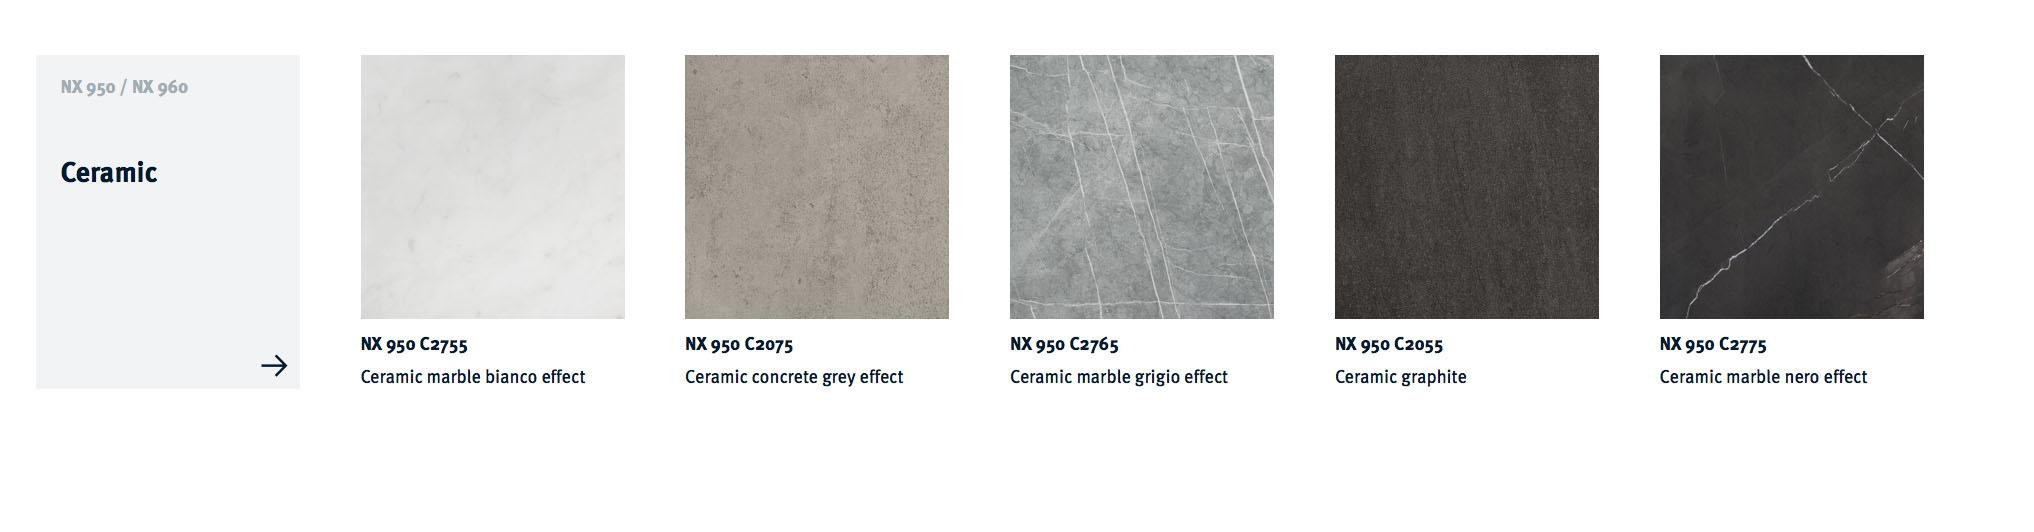 Next125 NX 950 Ceramic Colour Choices